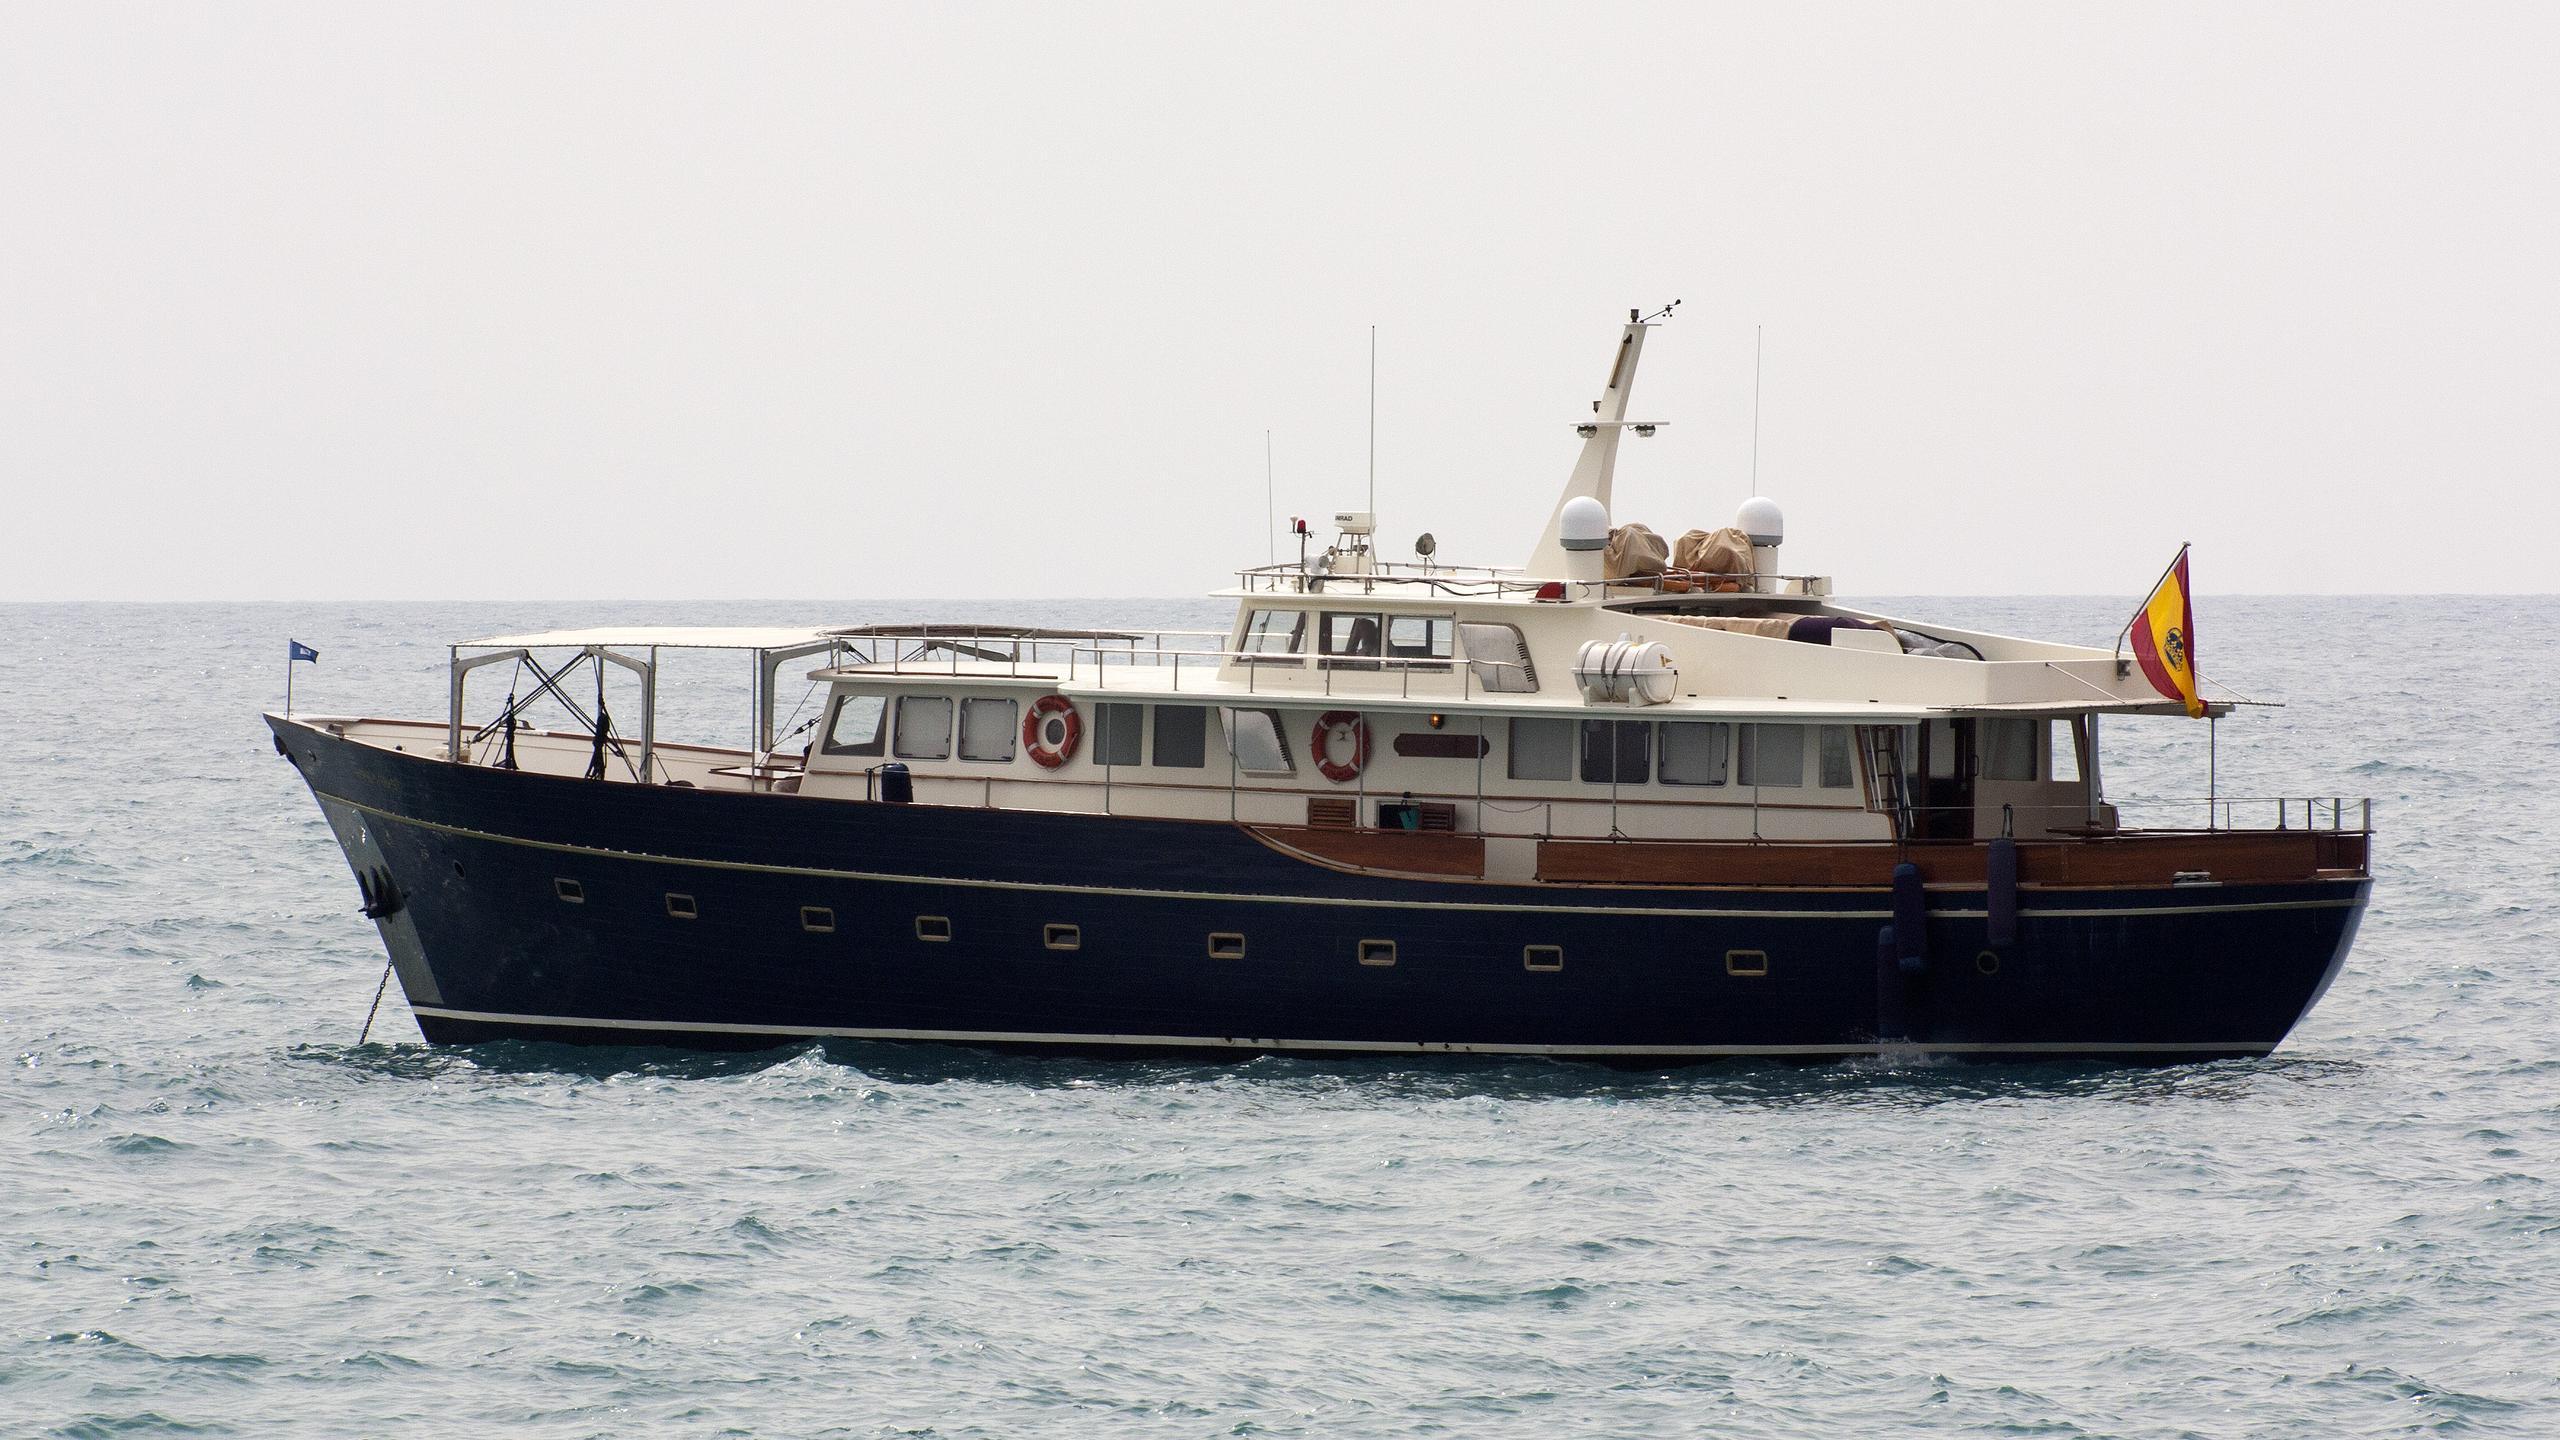 addaya-motor-yacht-cabanellas-1964-28m-profile